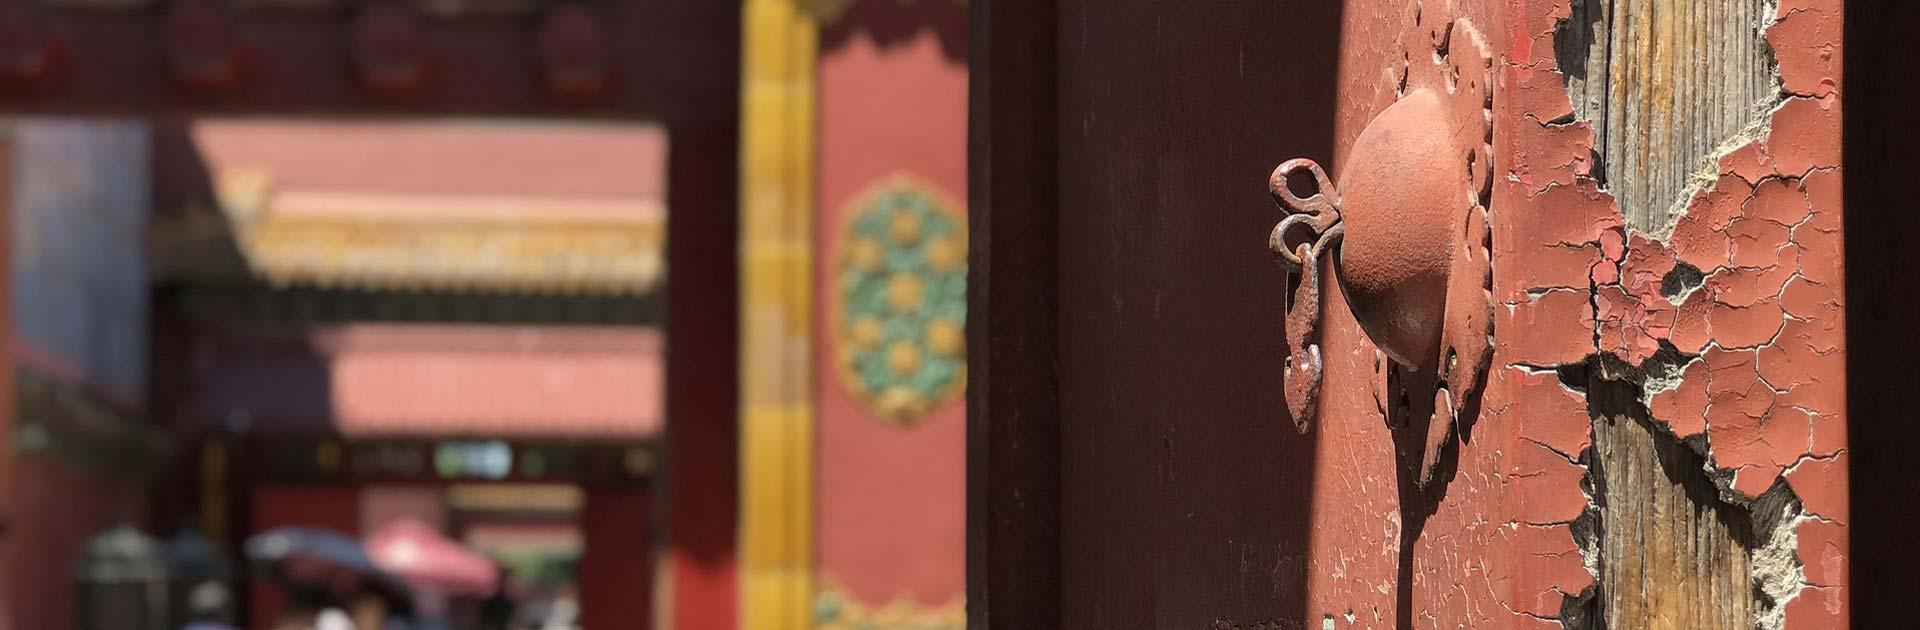 CNHK Lo Mejor de China Peking Shanghai y Hong Kong 12 días 2